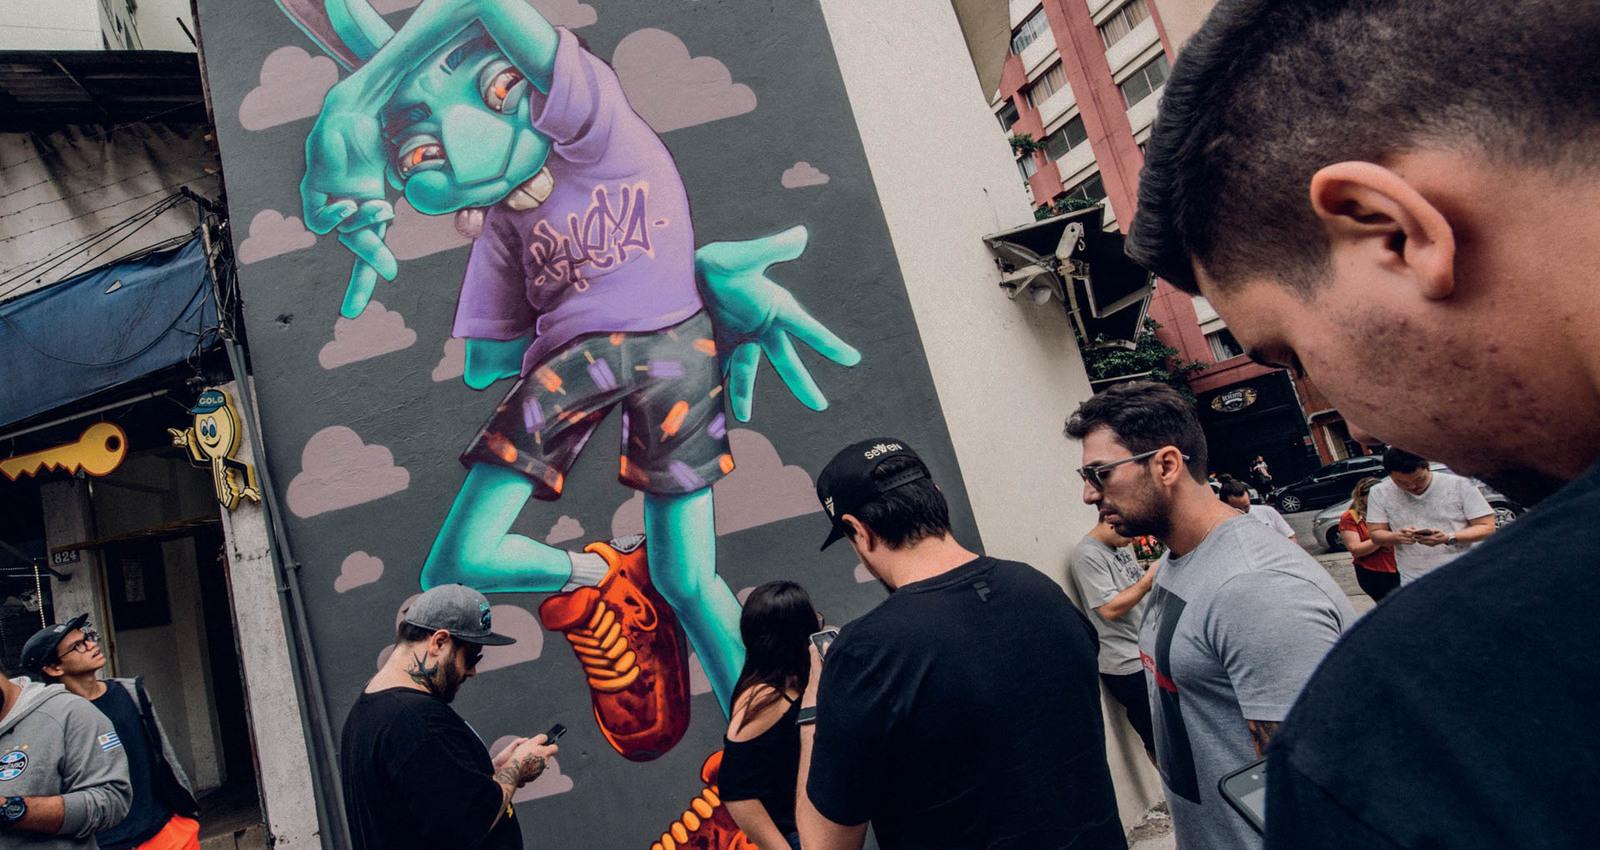 Air Max Graffiti Stores